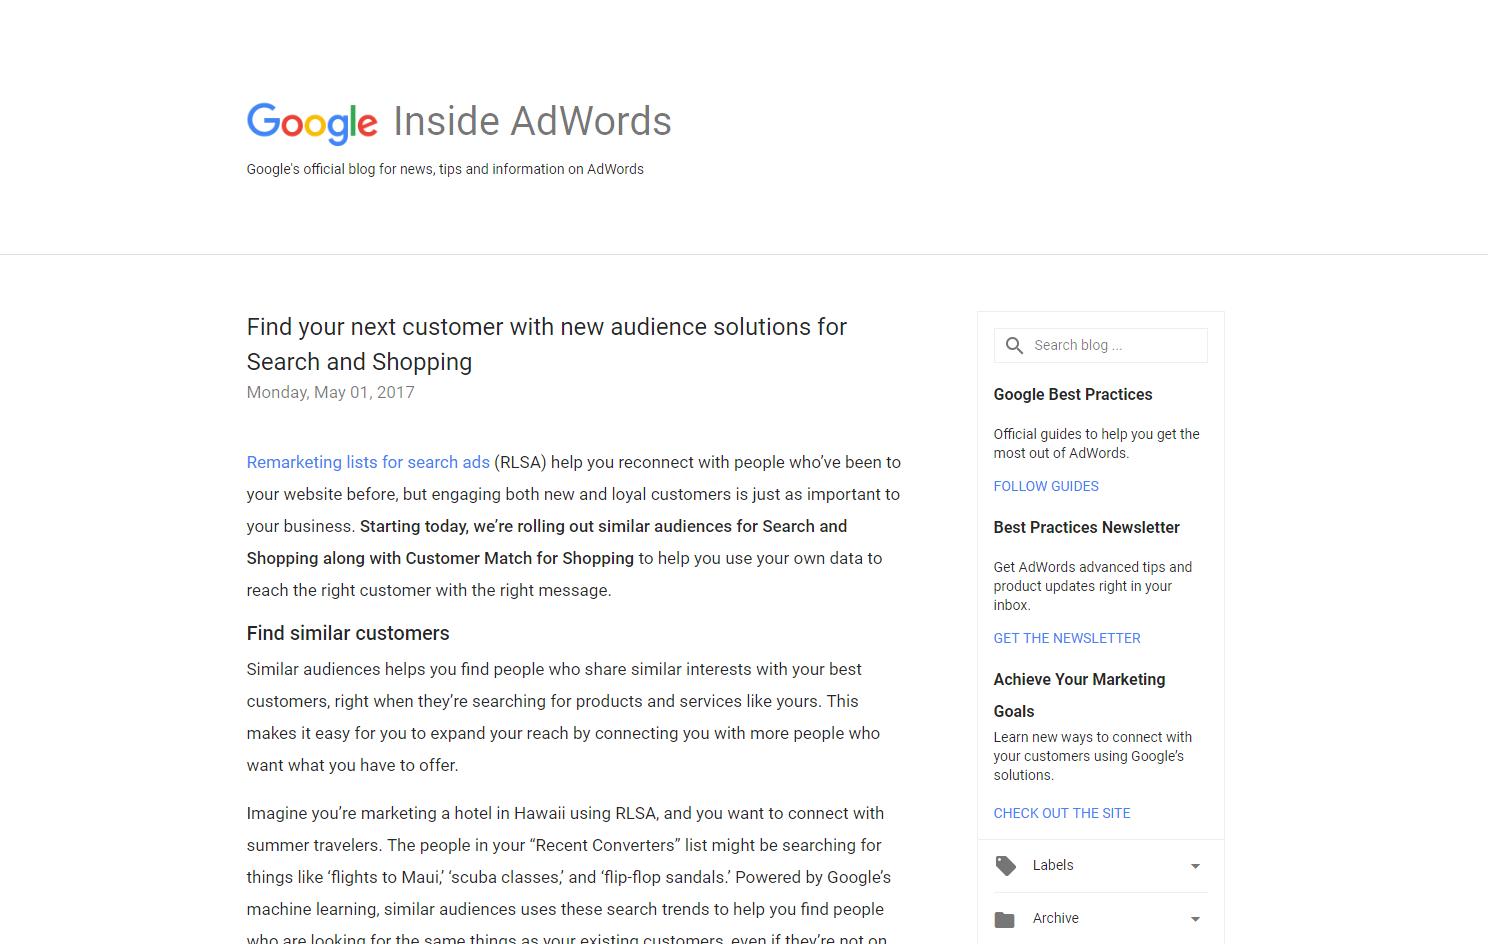 Google's Inside AdWords